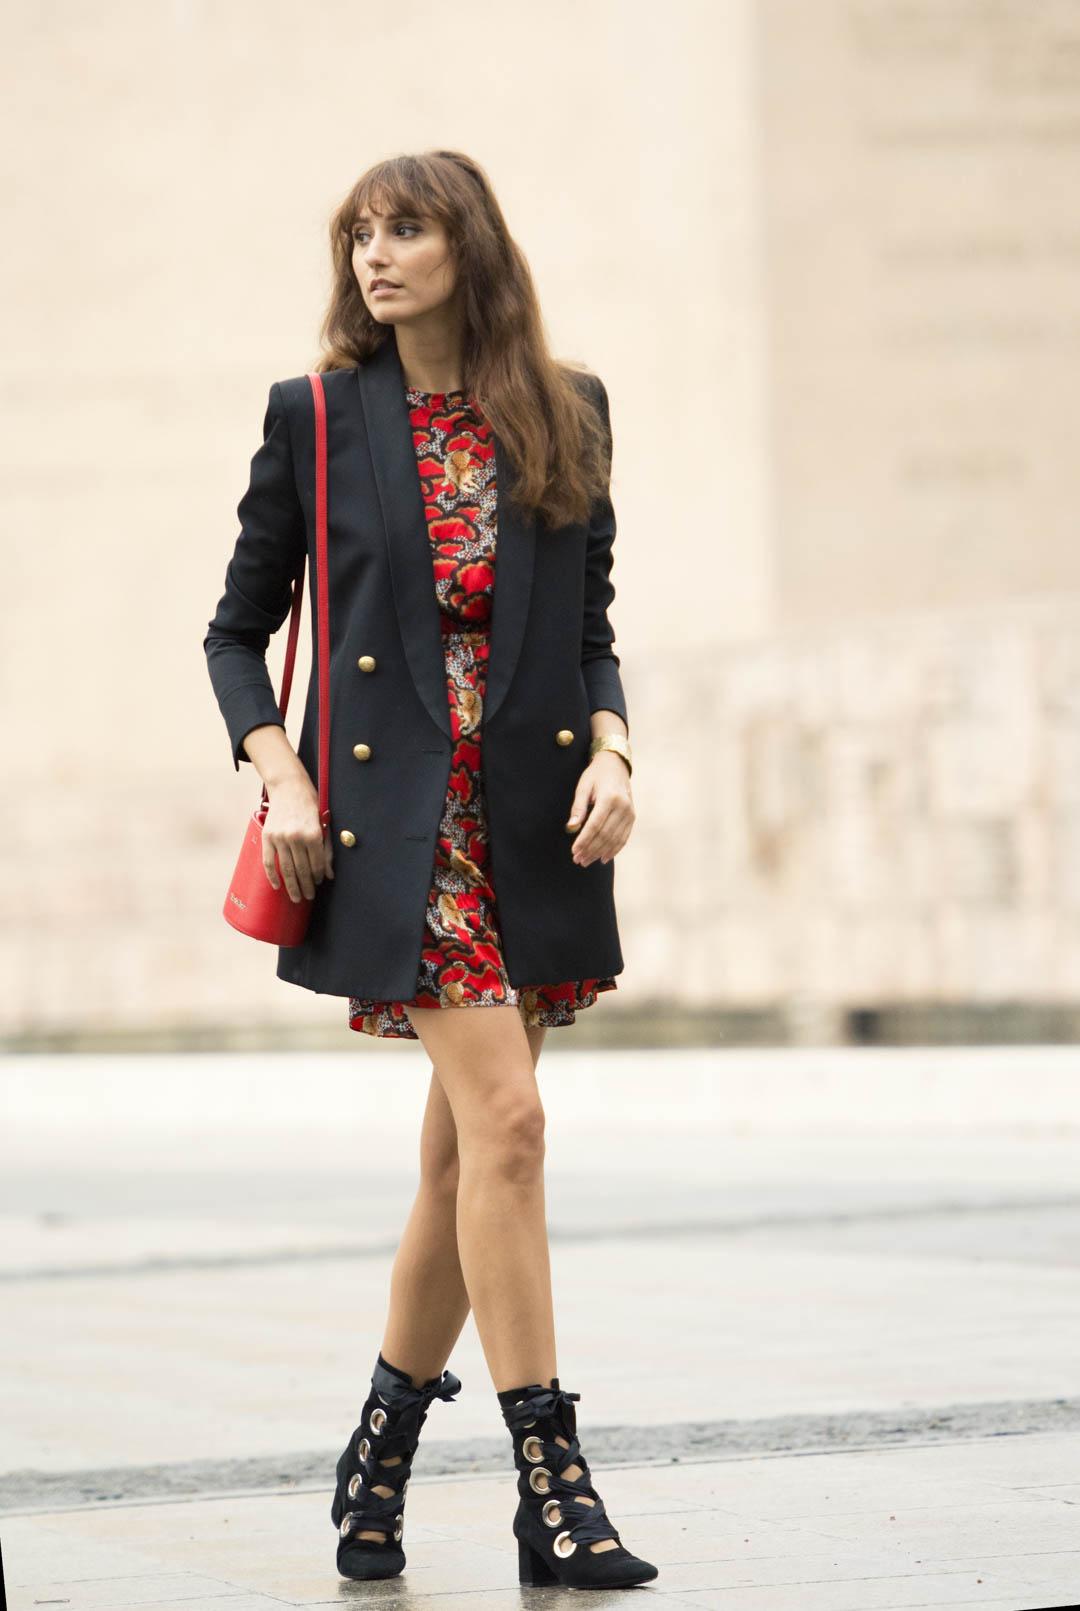 sandro-red-dress-mitmeblog-street-style-mayte-de-la-iglesia-web-06